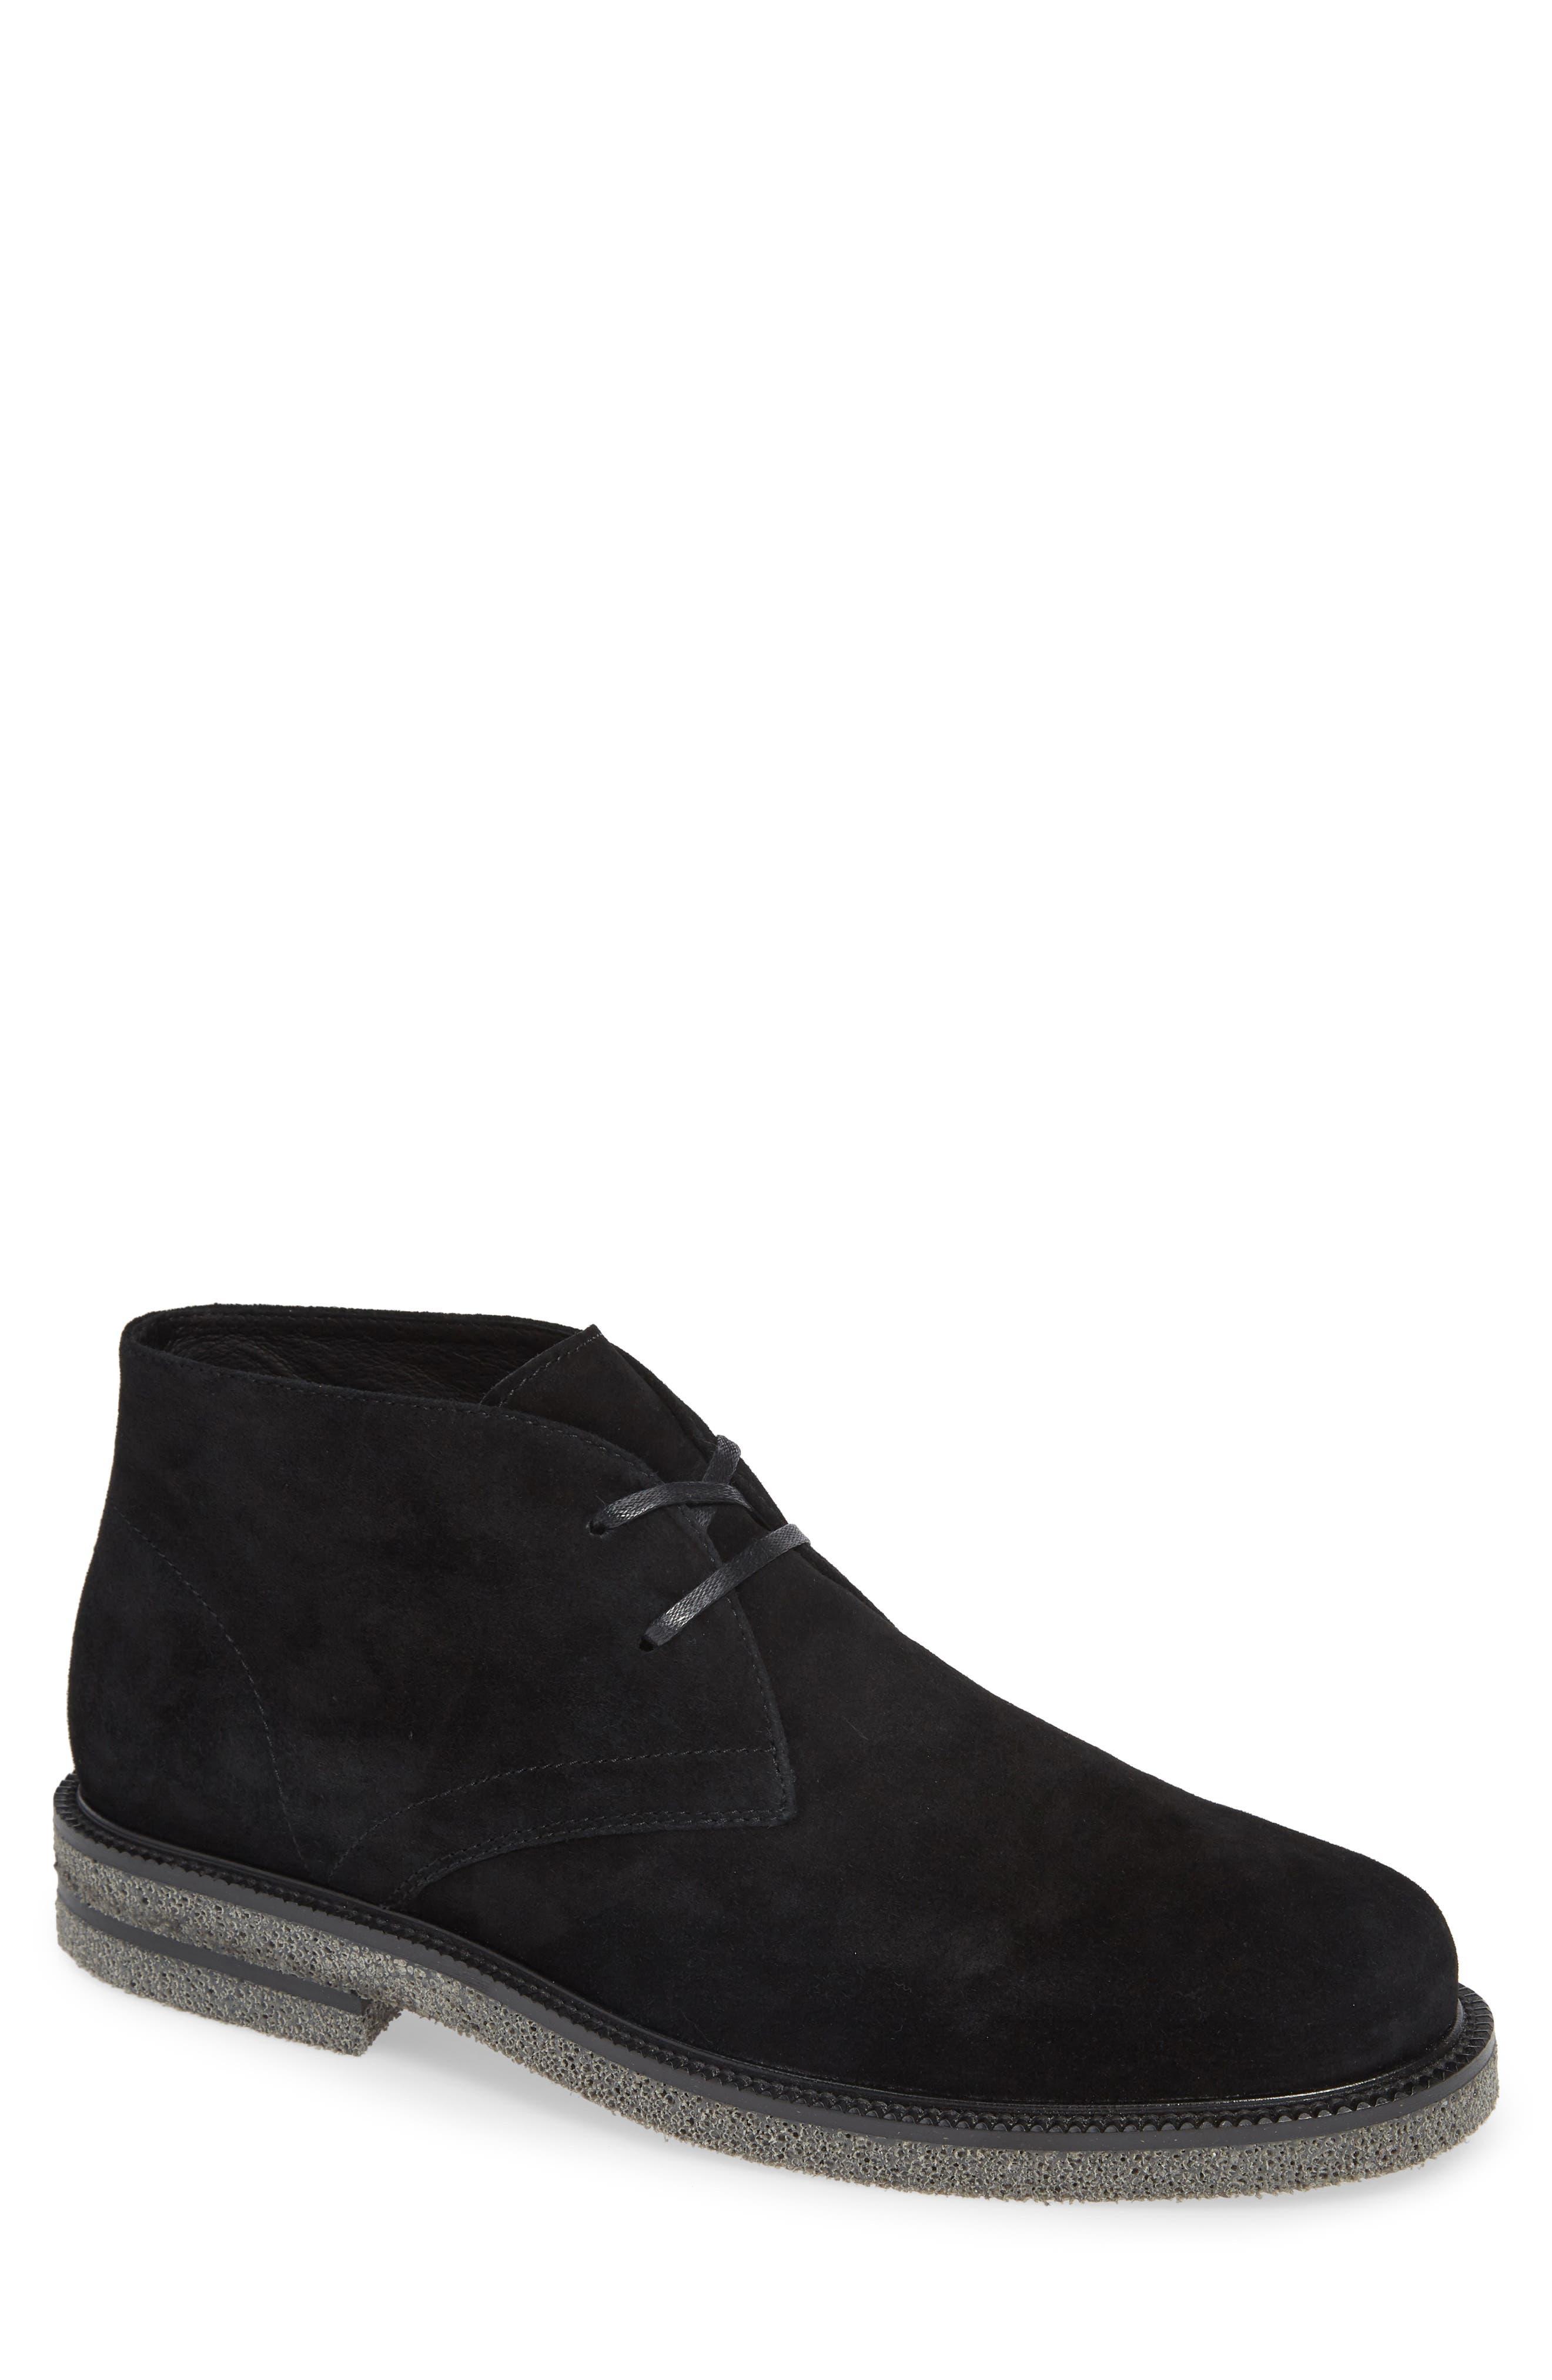 Levi Chukka Boot,                         Main,                         color, BLACK